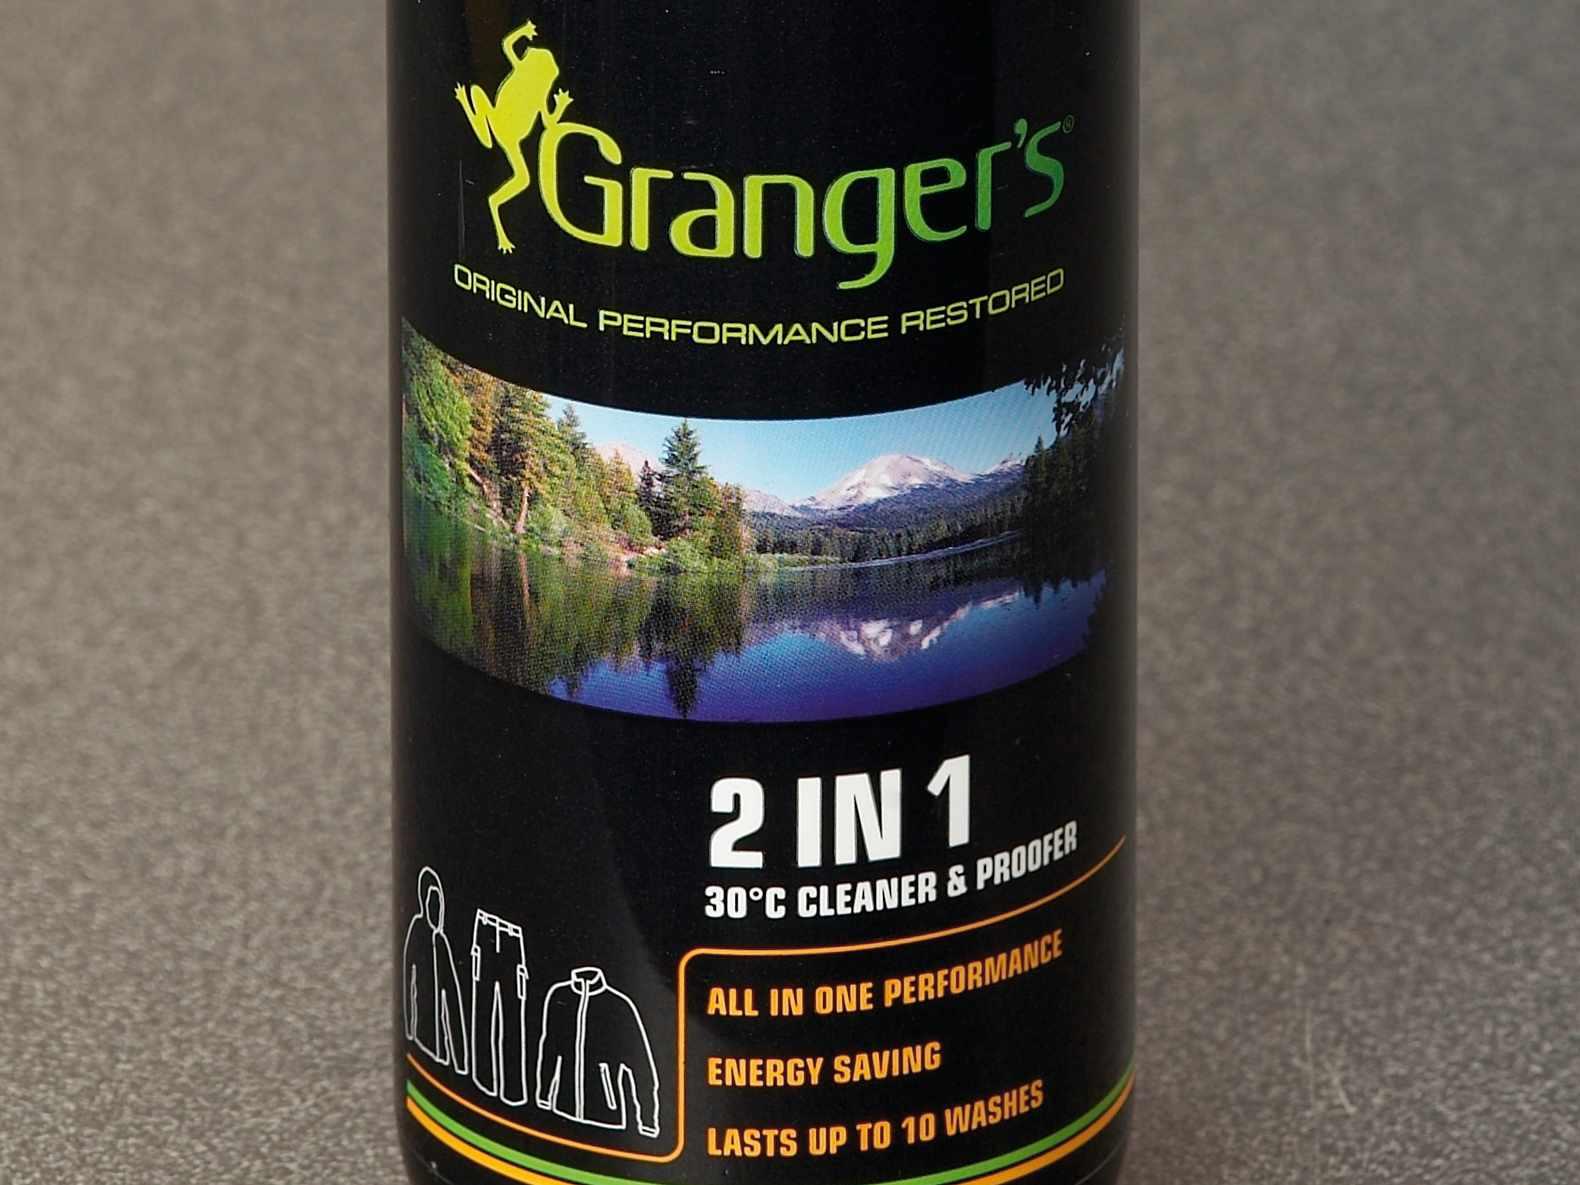 Granger's 2-in-1 Cleaner/Proofer